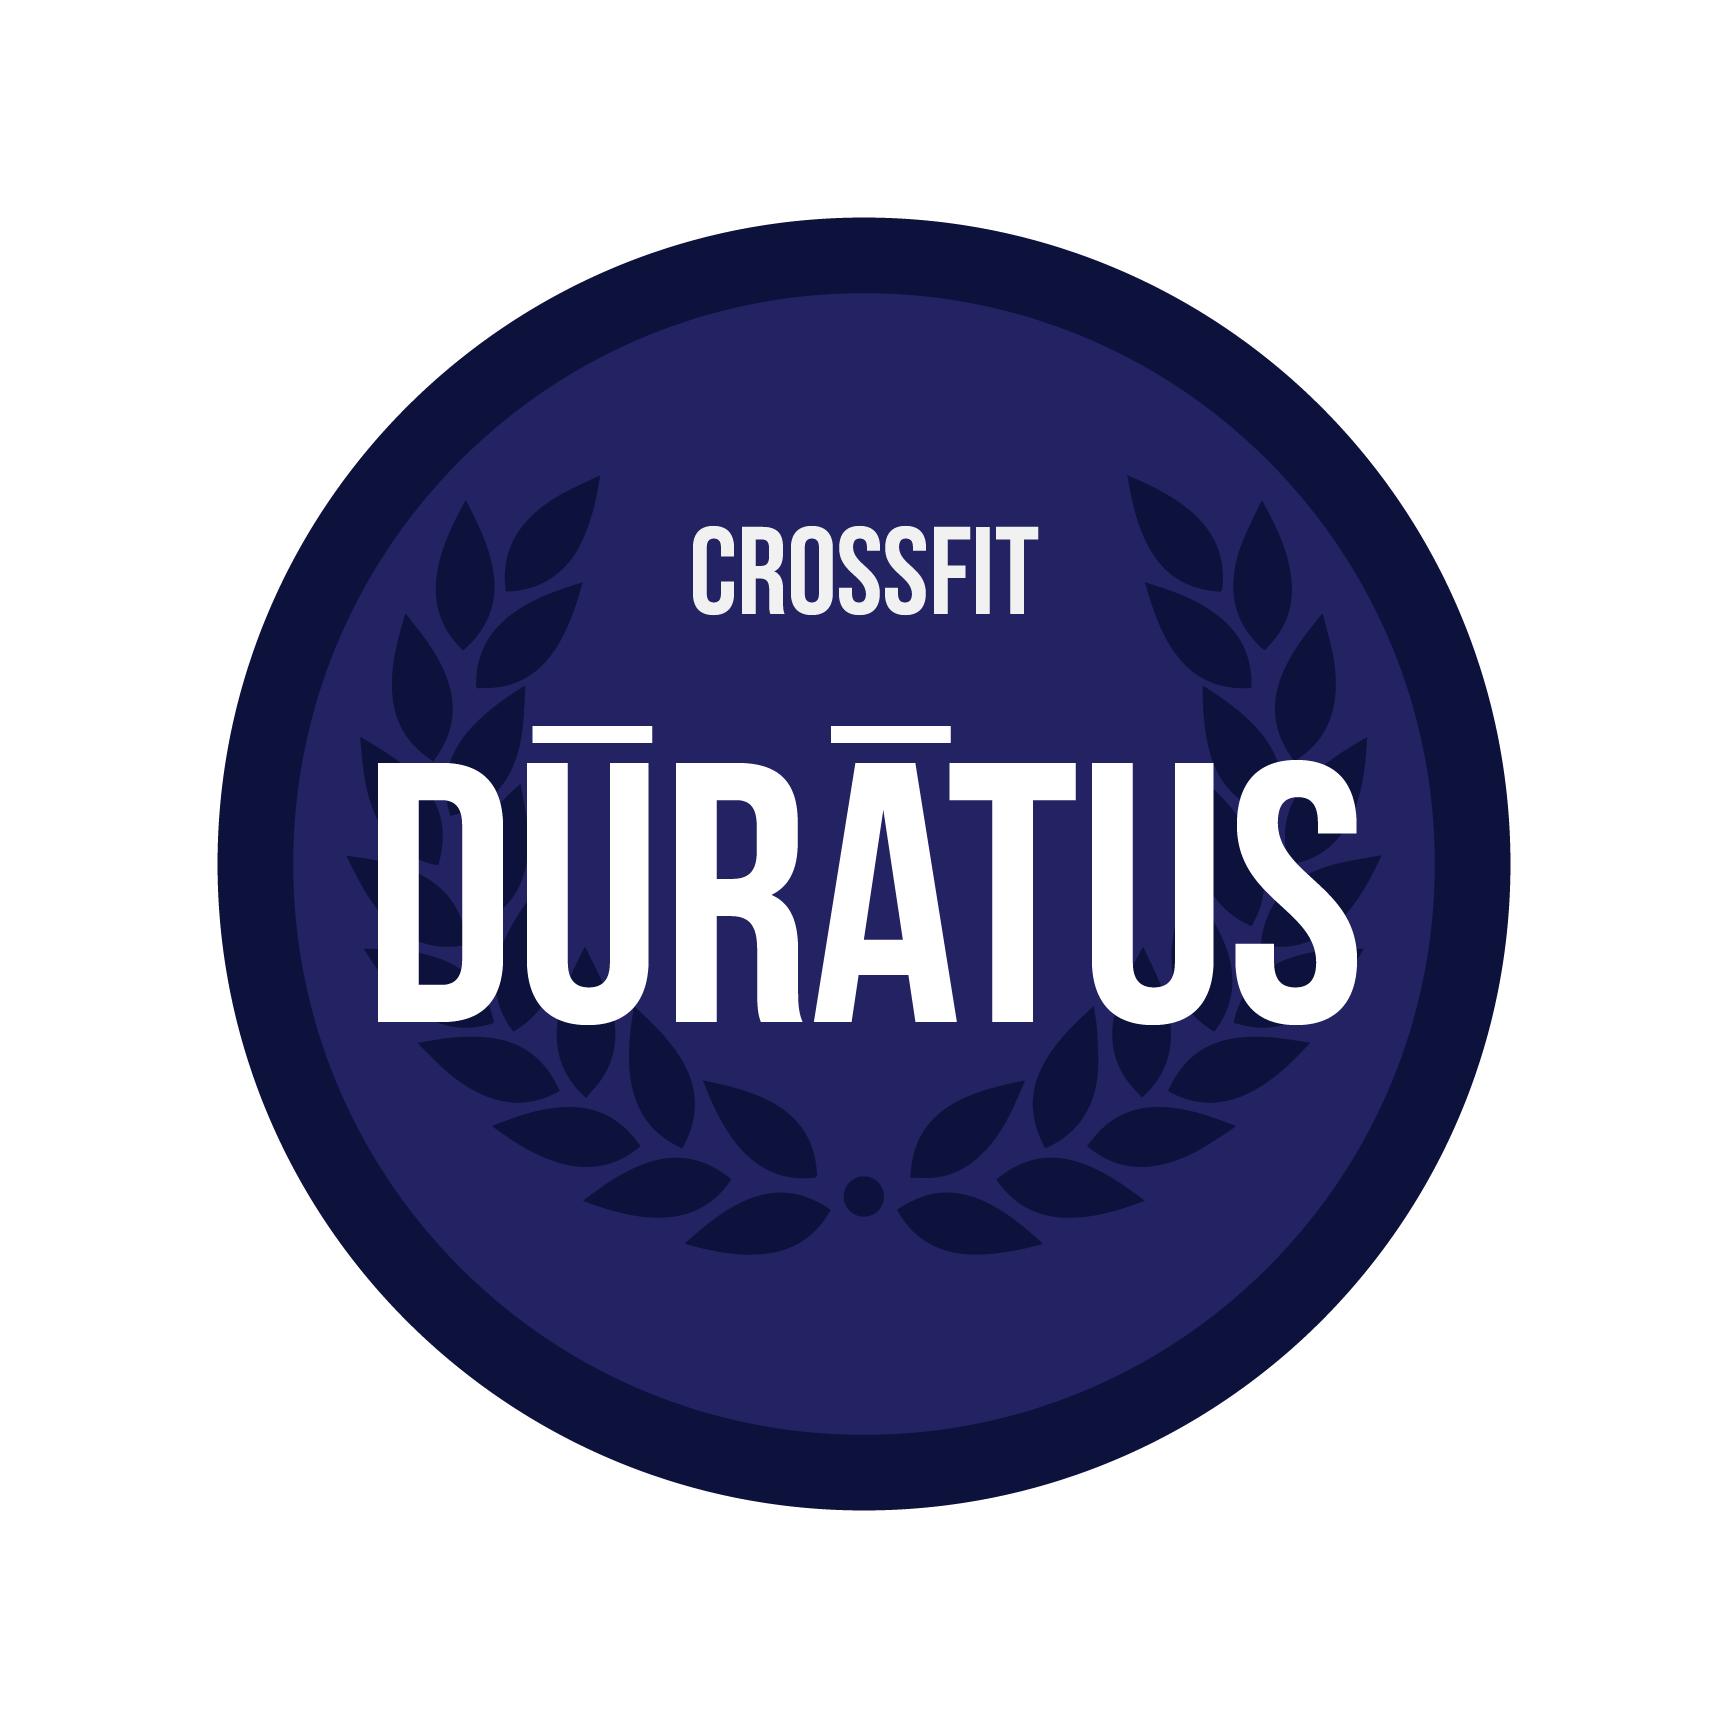 DURATUS CROSSFIT GYM